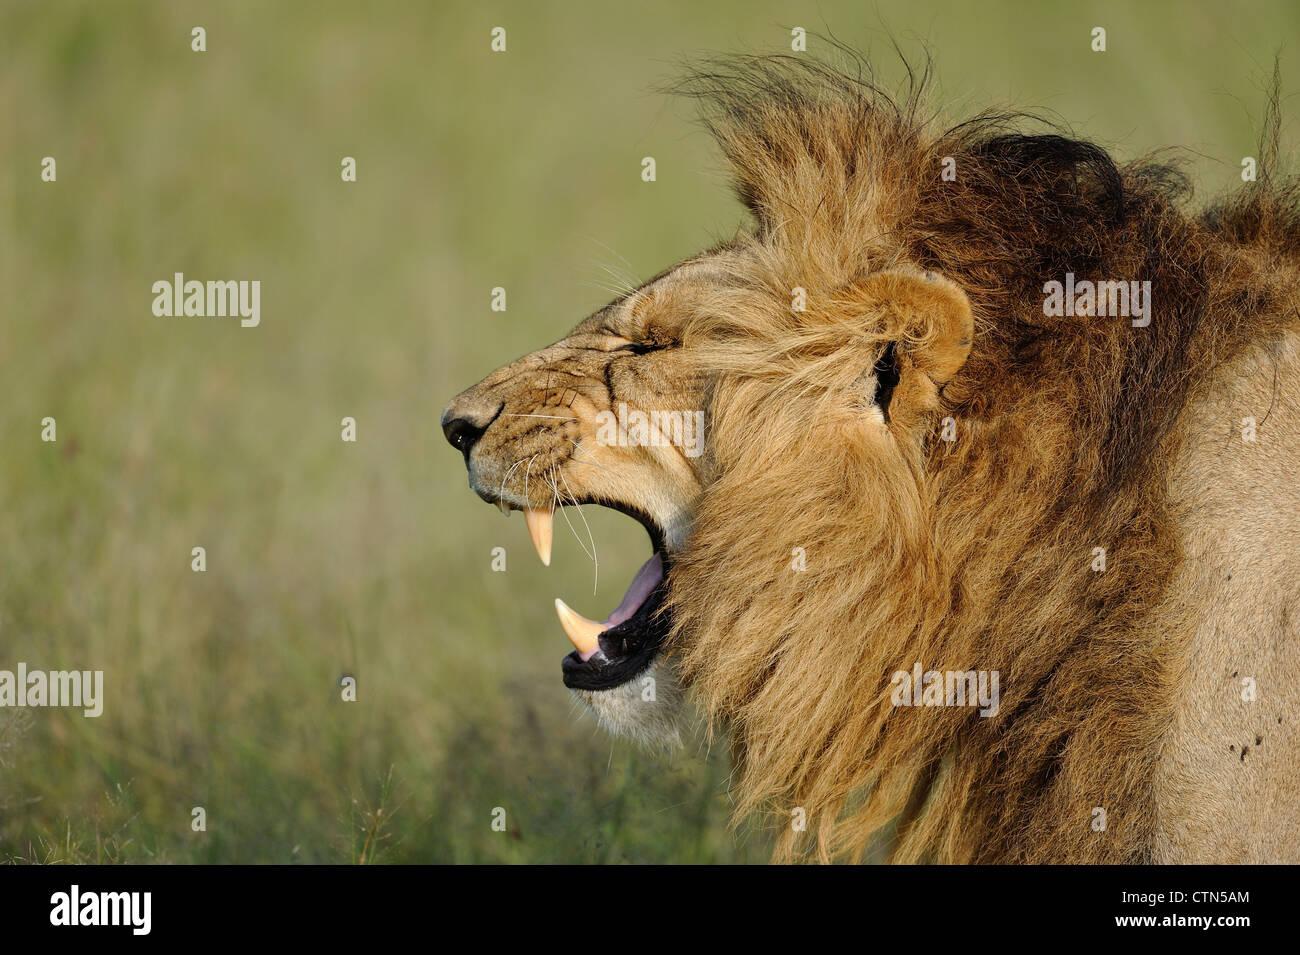 East African lion - Massai lion (Panthera leo nubica) male grimacing when yawning Masai Mara - Kenya - East Africa - Stock Image